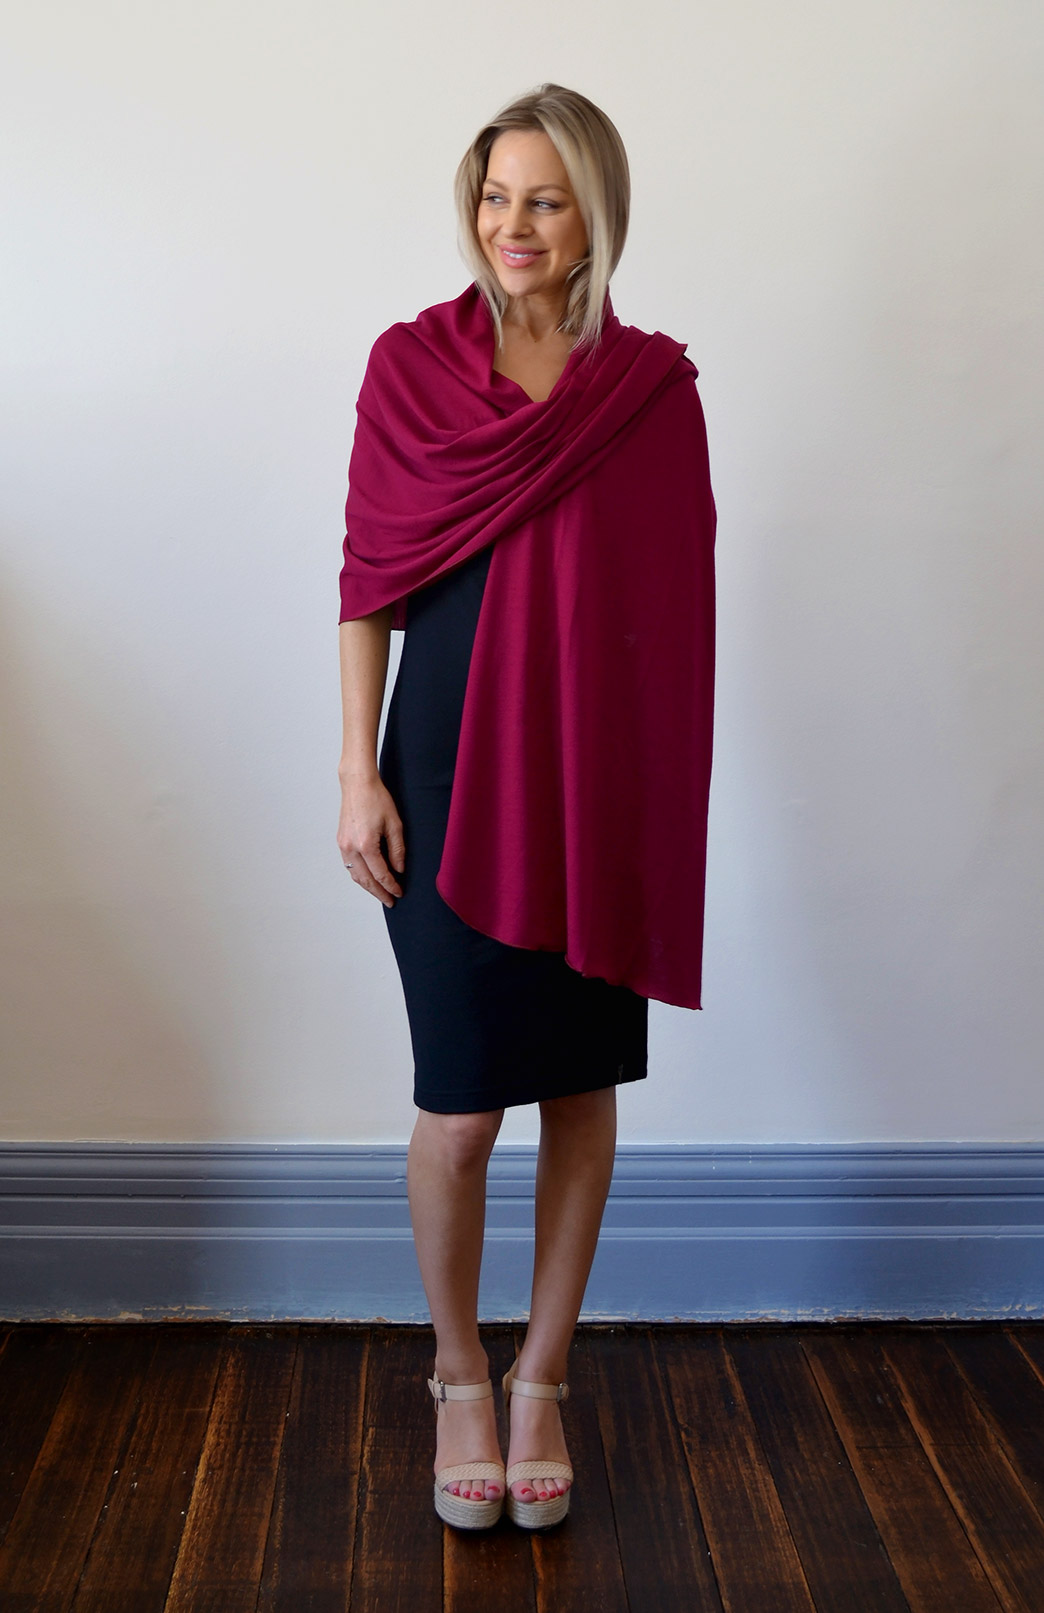 Heavyweight Wrap - Women's Superfine Merino Wool Classic Wide Scarf - Smitten Merino Tasmania Australia